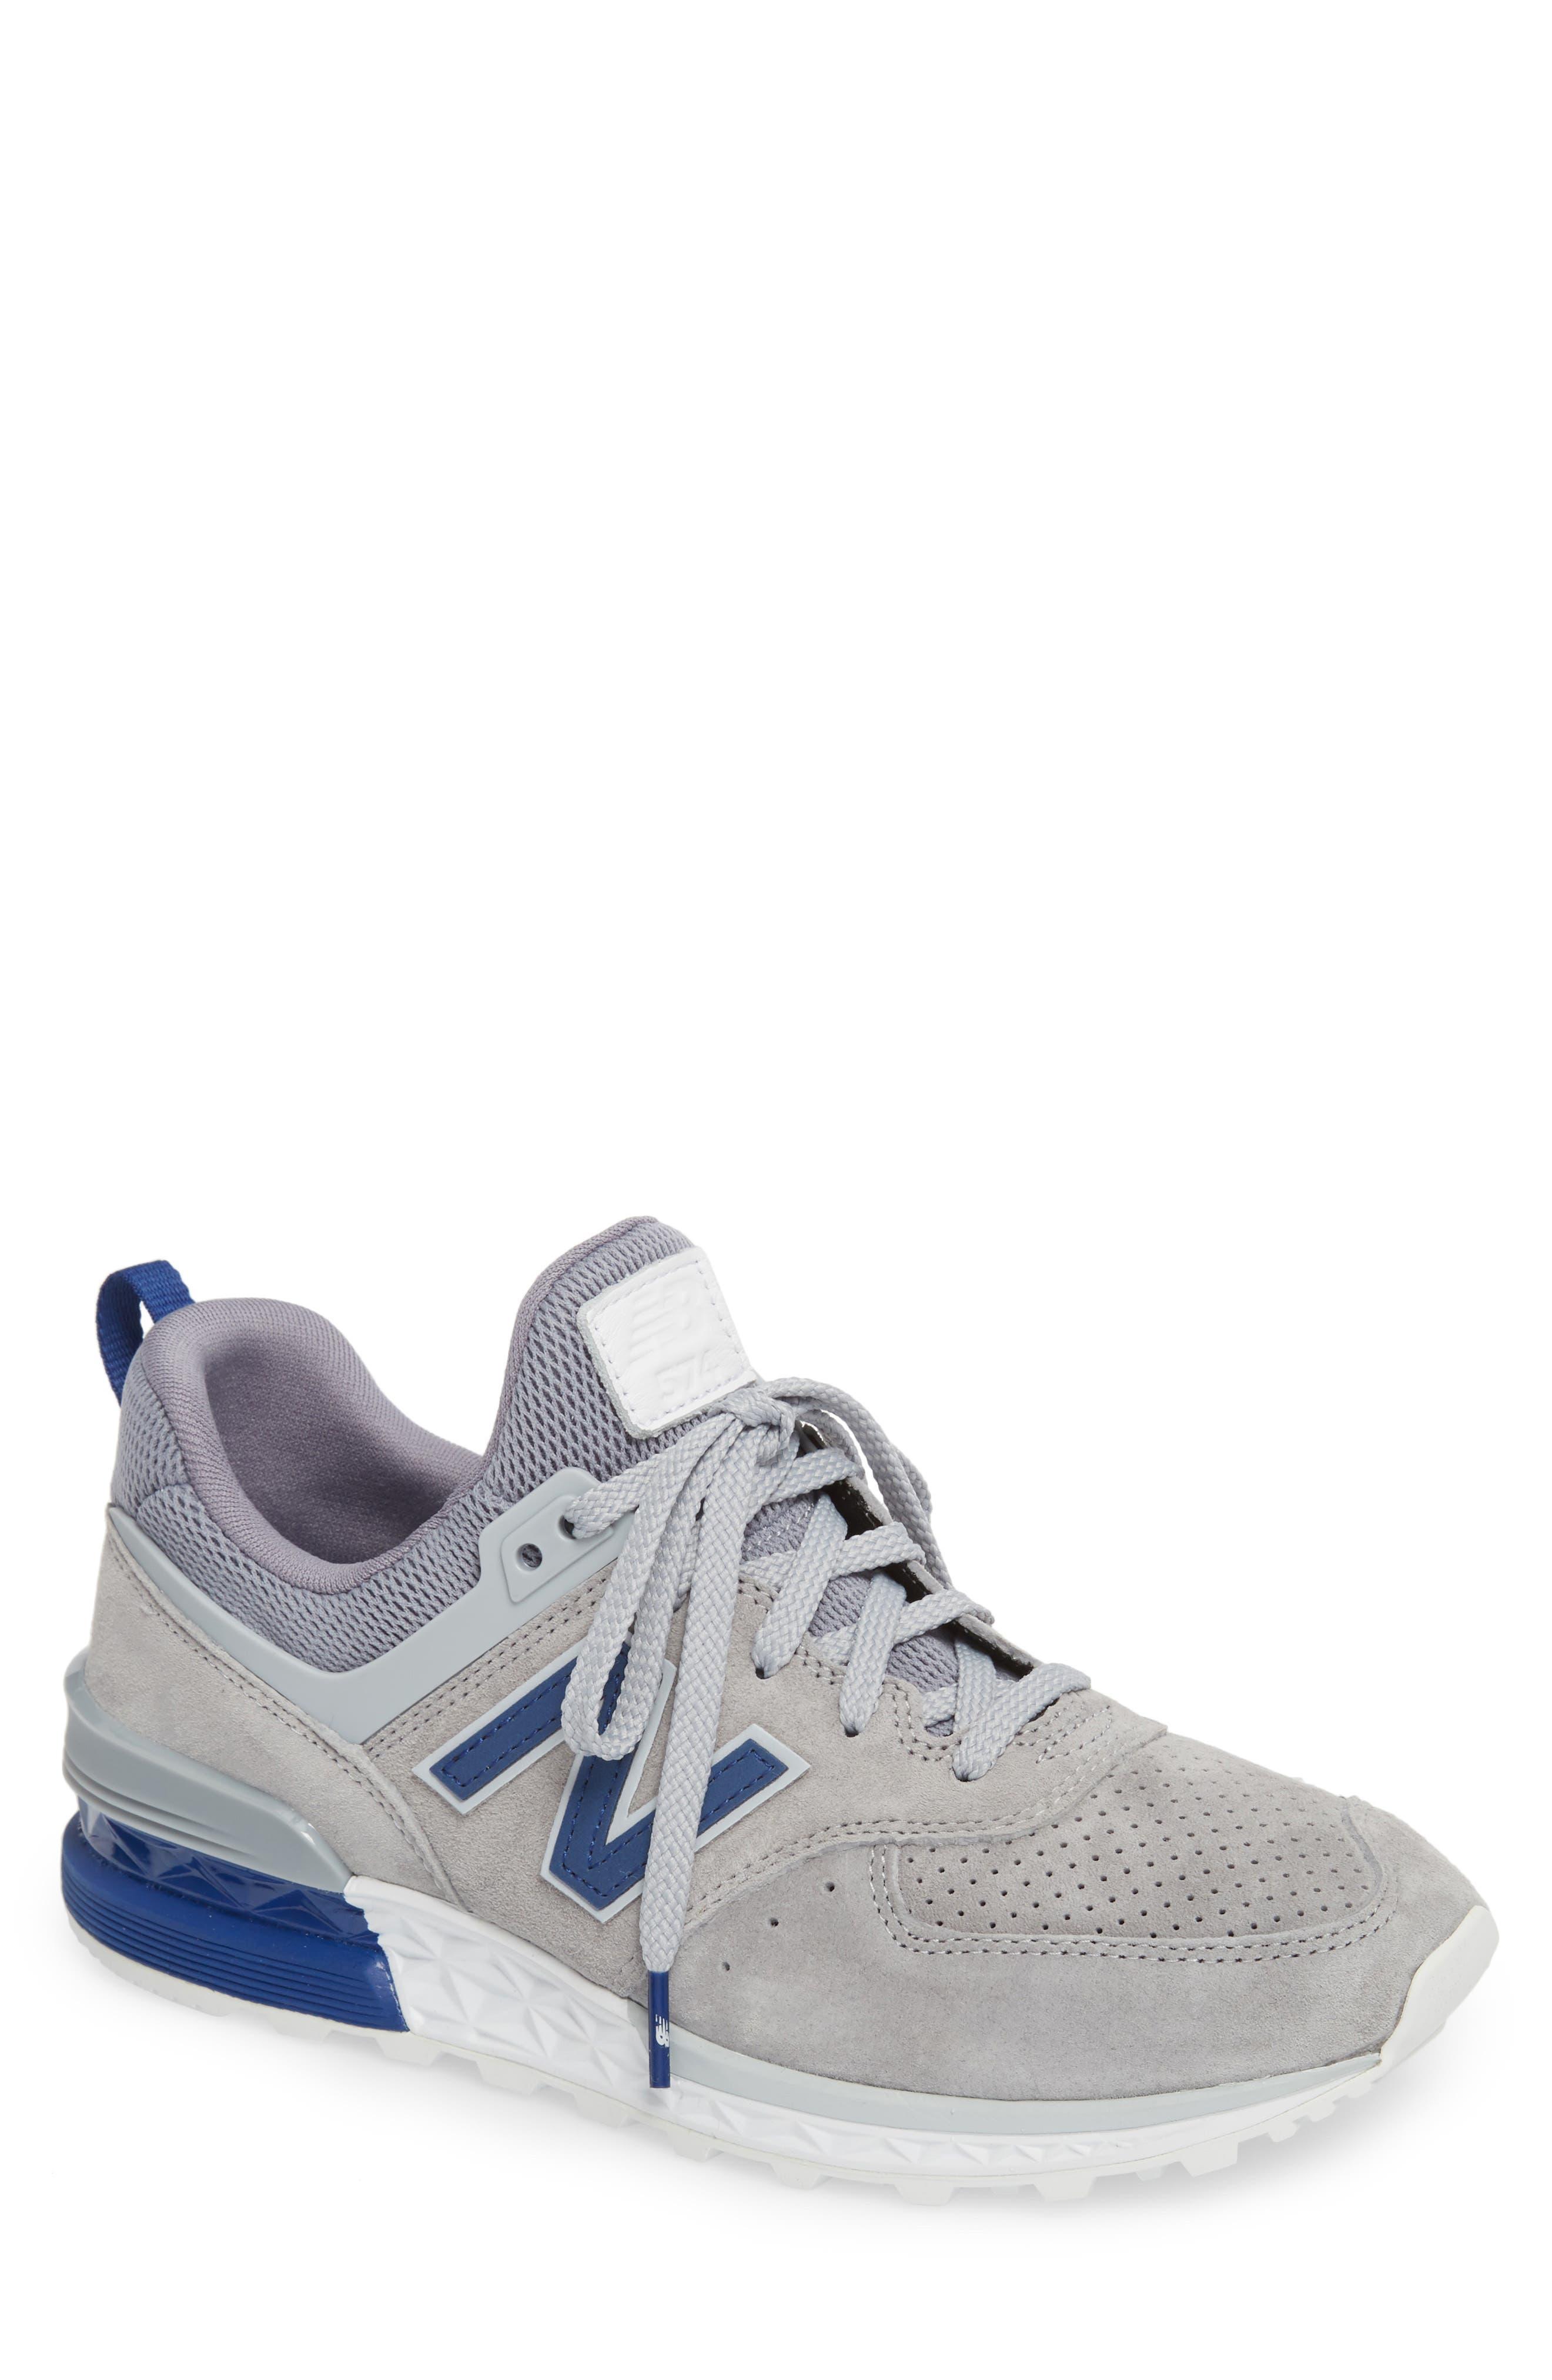 574 Sport Sneaker,                             Main thumbnail 1, color,                             STEEL GREY